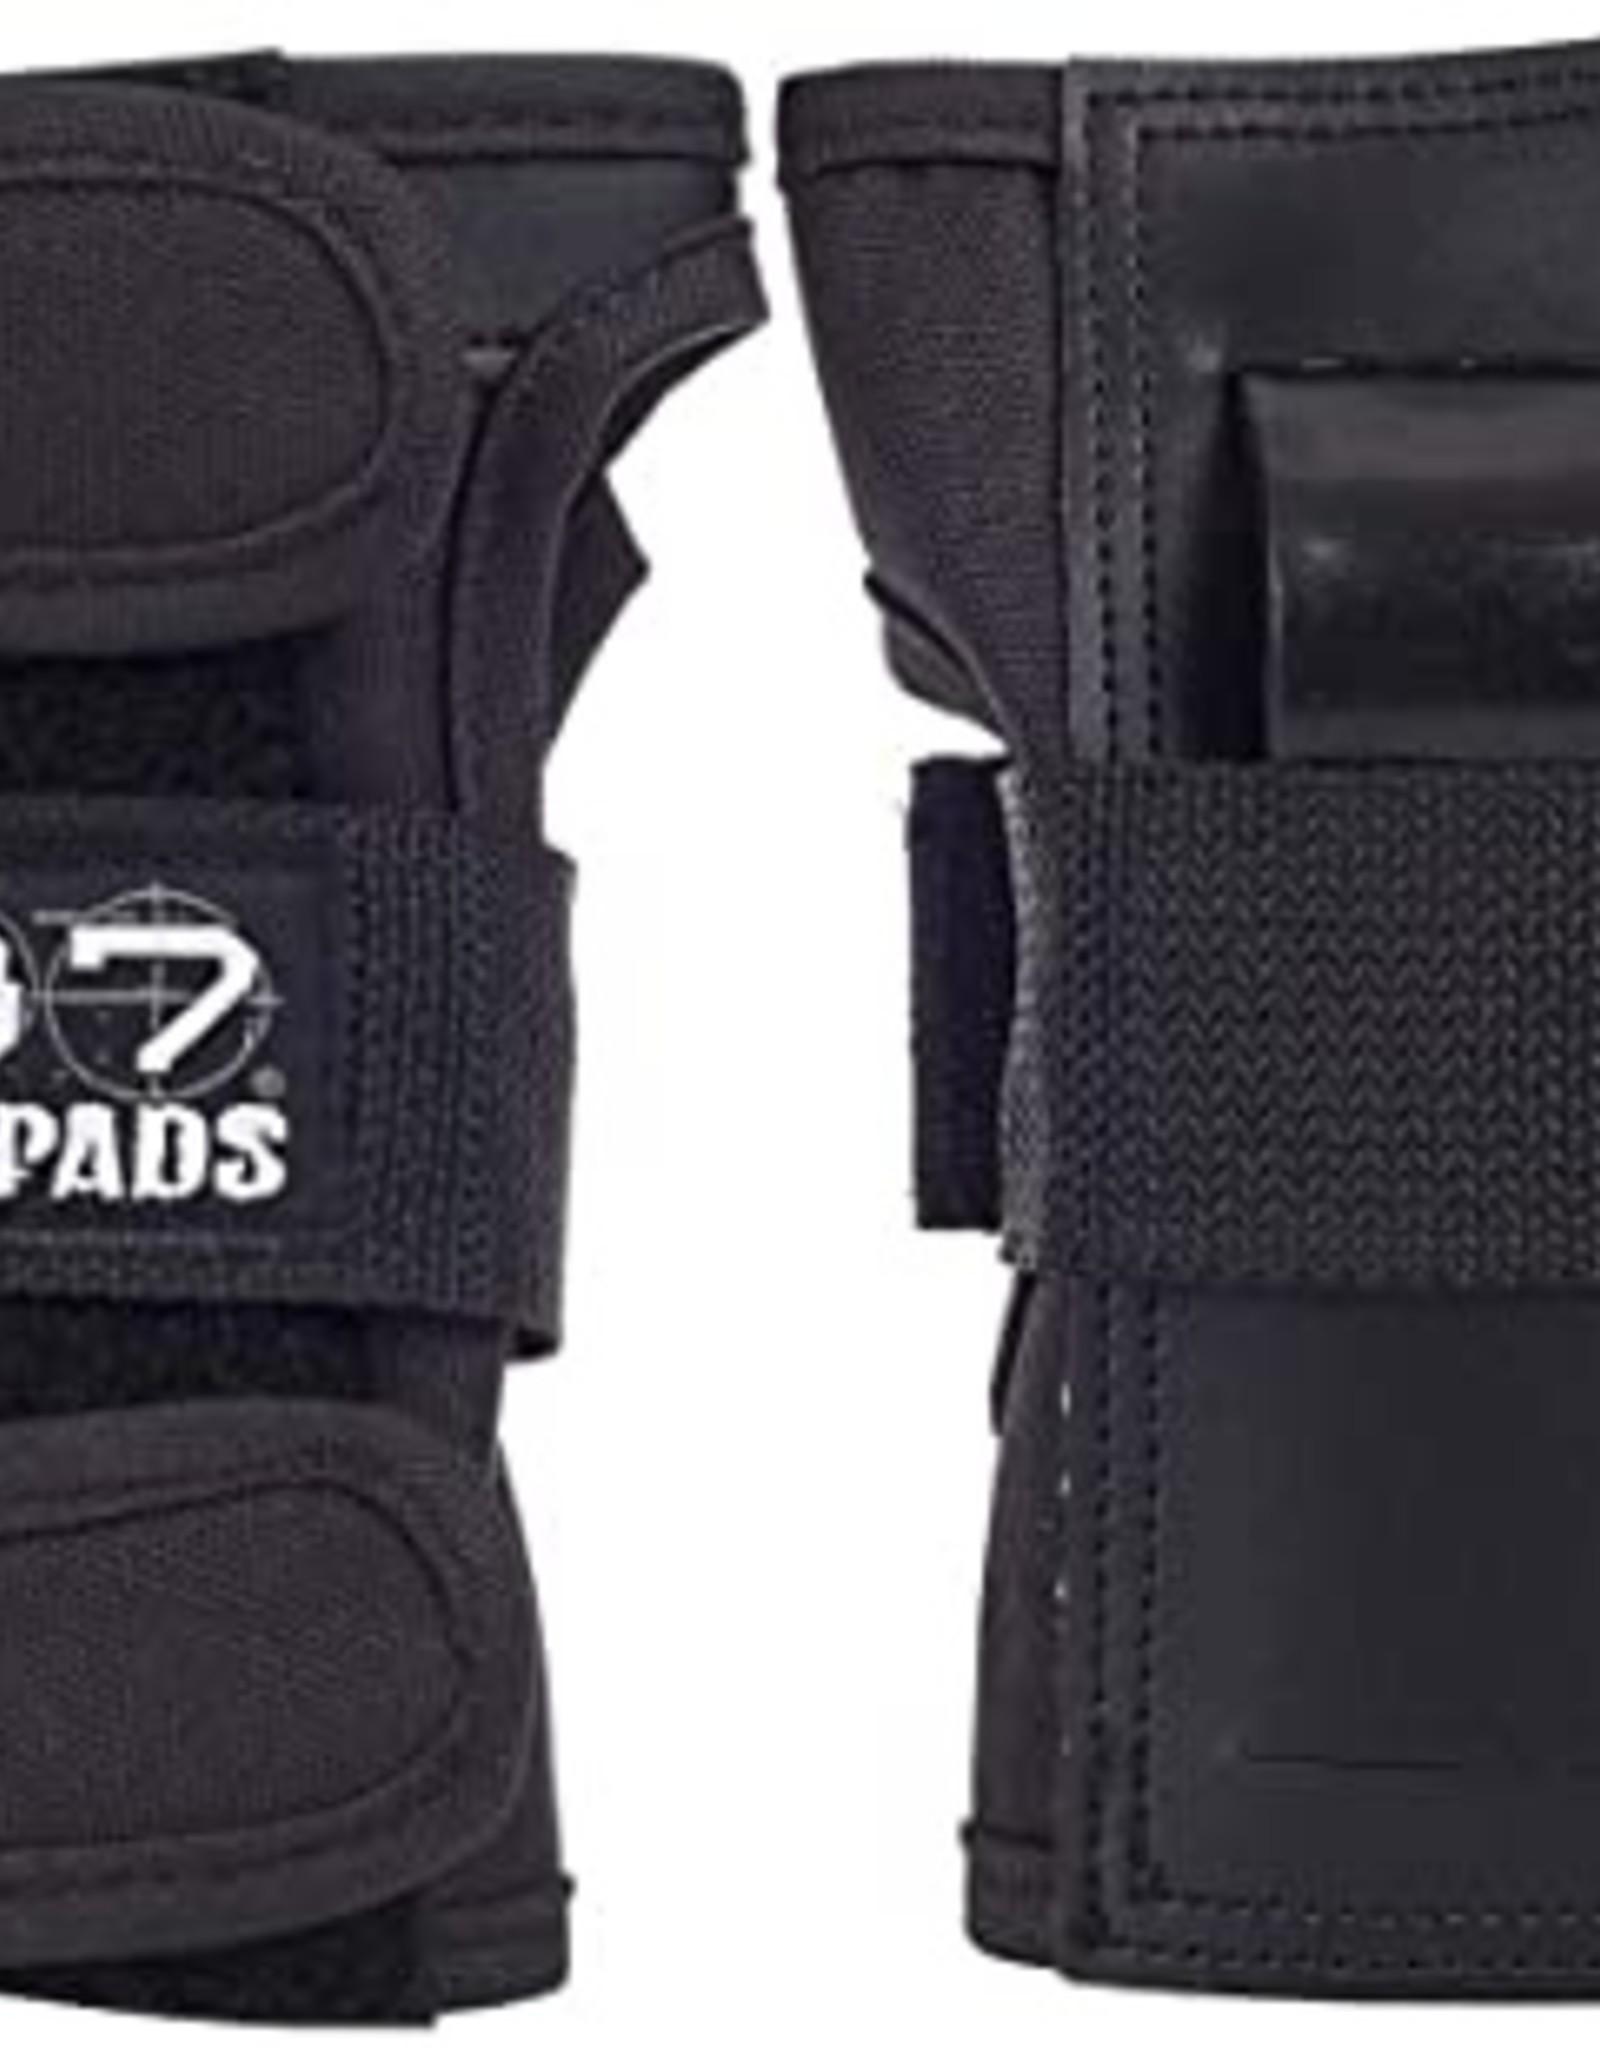 187 187 Wrist guards Black